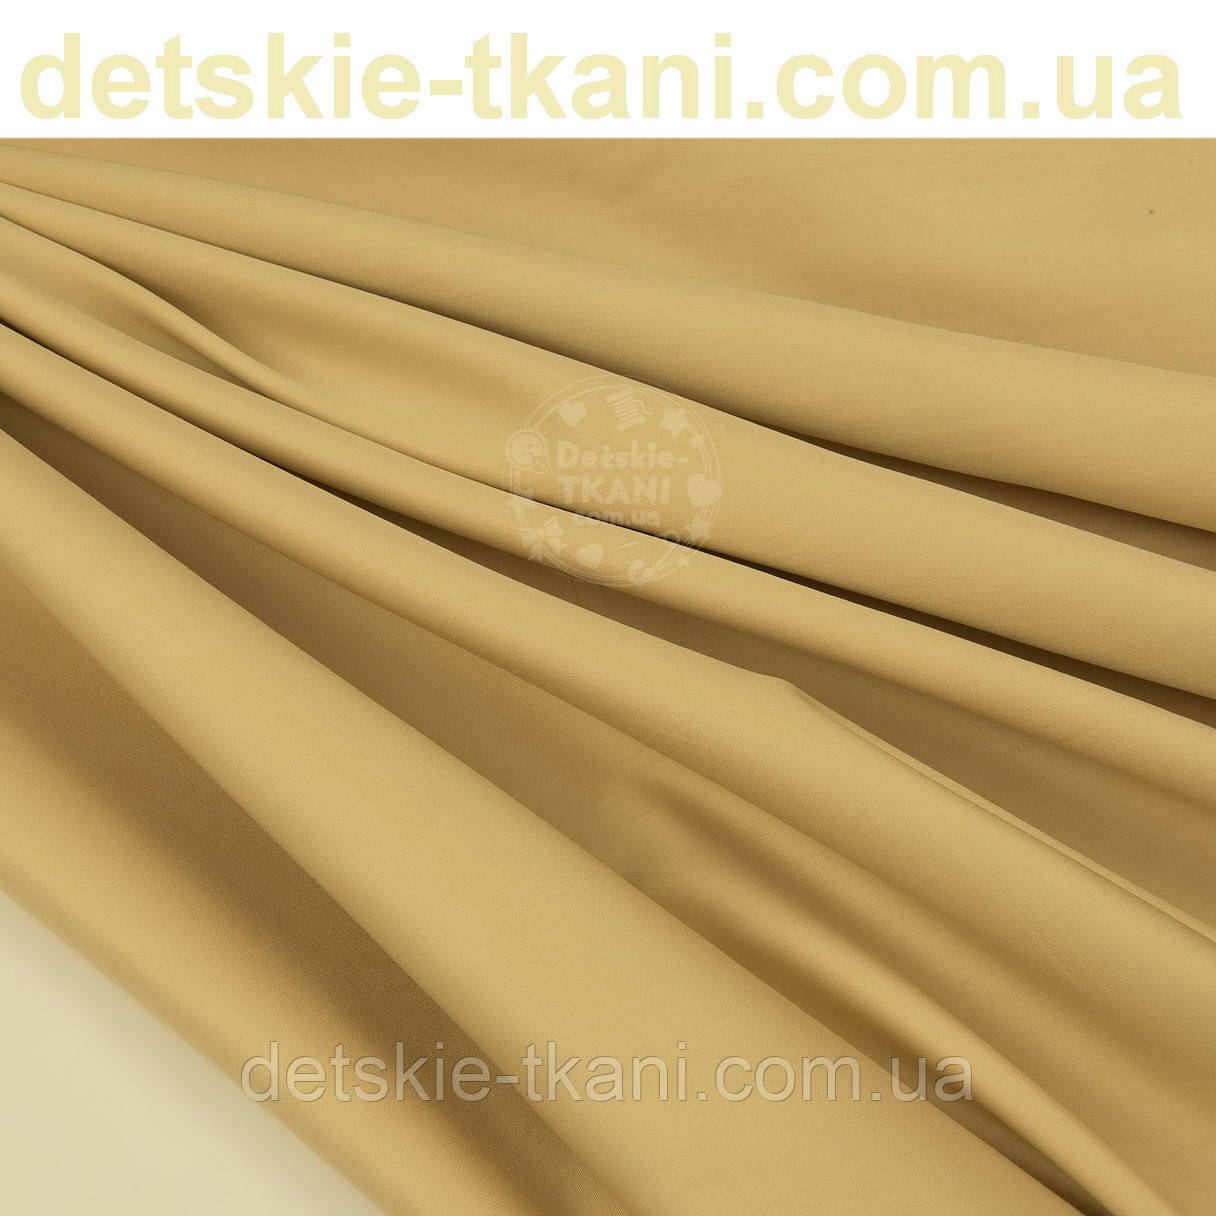 Сатин премиум, цвет золотисто-бежевый, ширина 240 см (№1079)